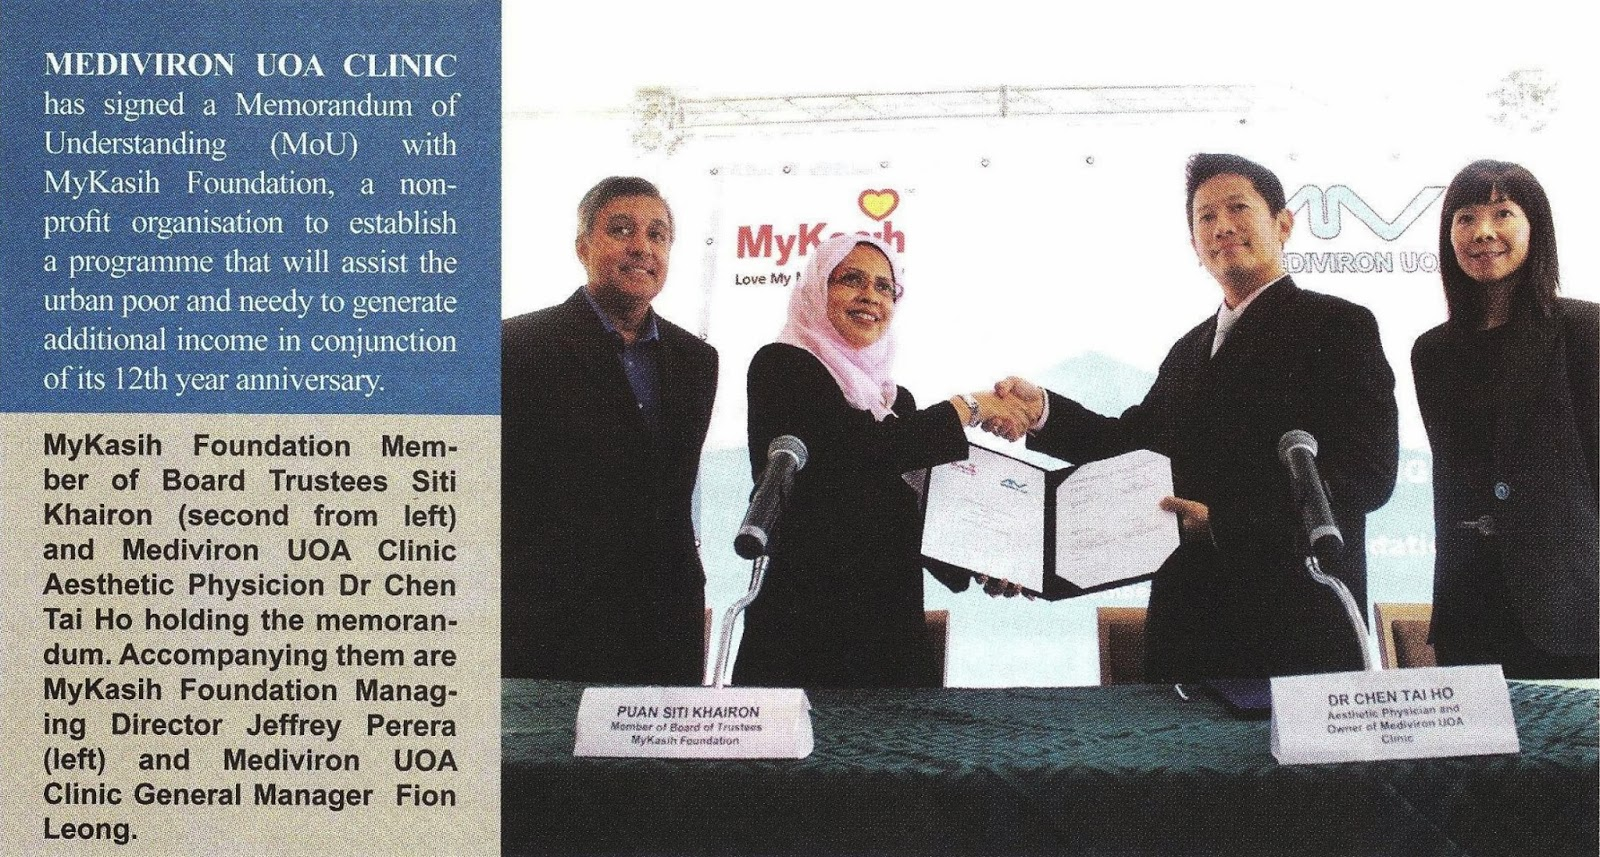 201310_SME Malaysia_SME Events - Mediviron UOA Clinic